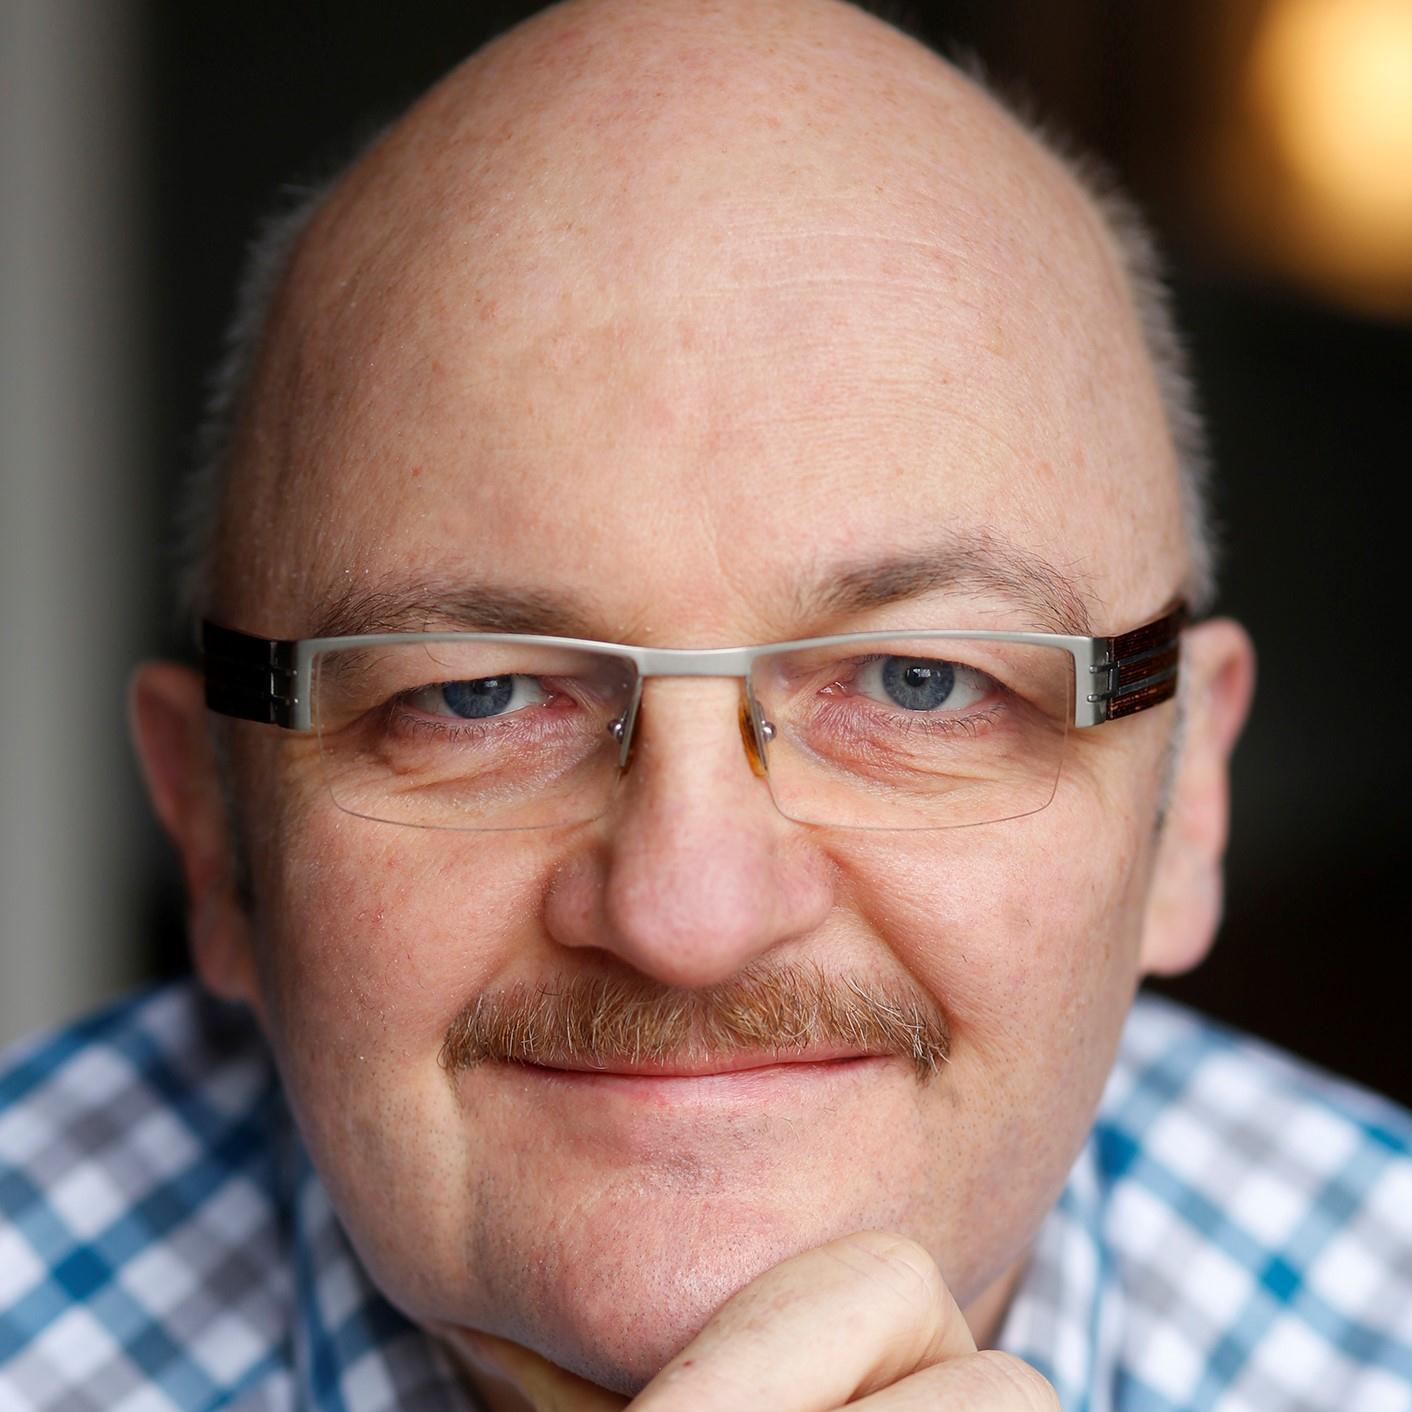 Gerrit Jessen Portrait casual.jpg